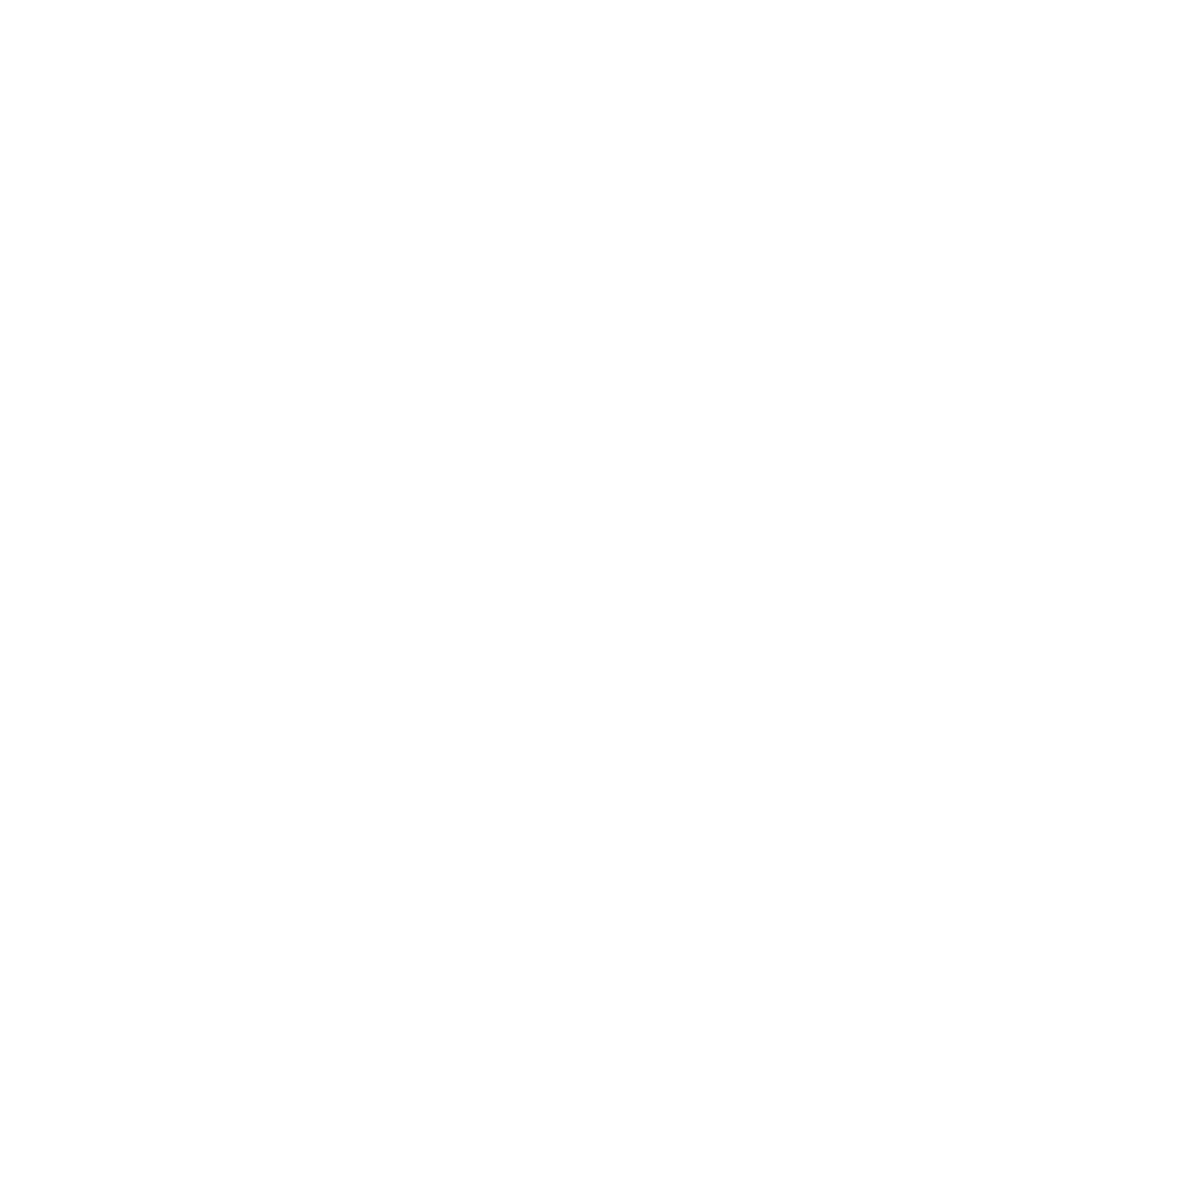 Oglasi licni kontakti sarajevo | Main page | unseliberg